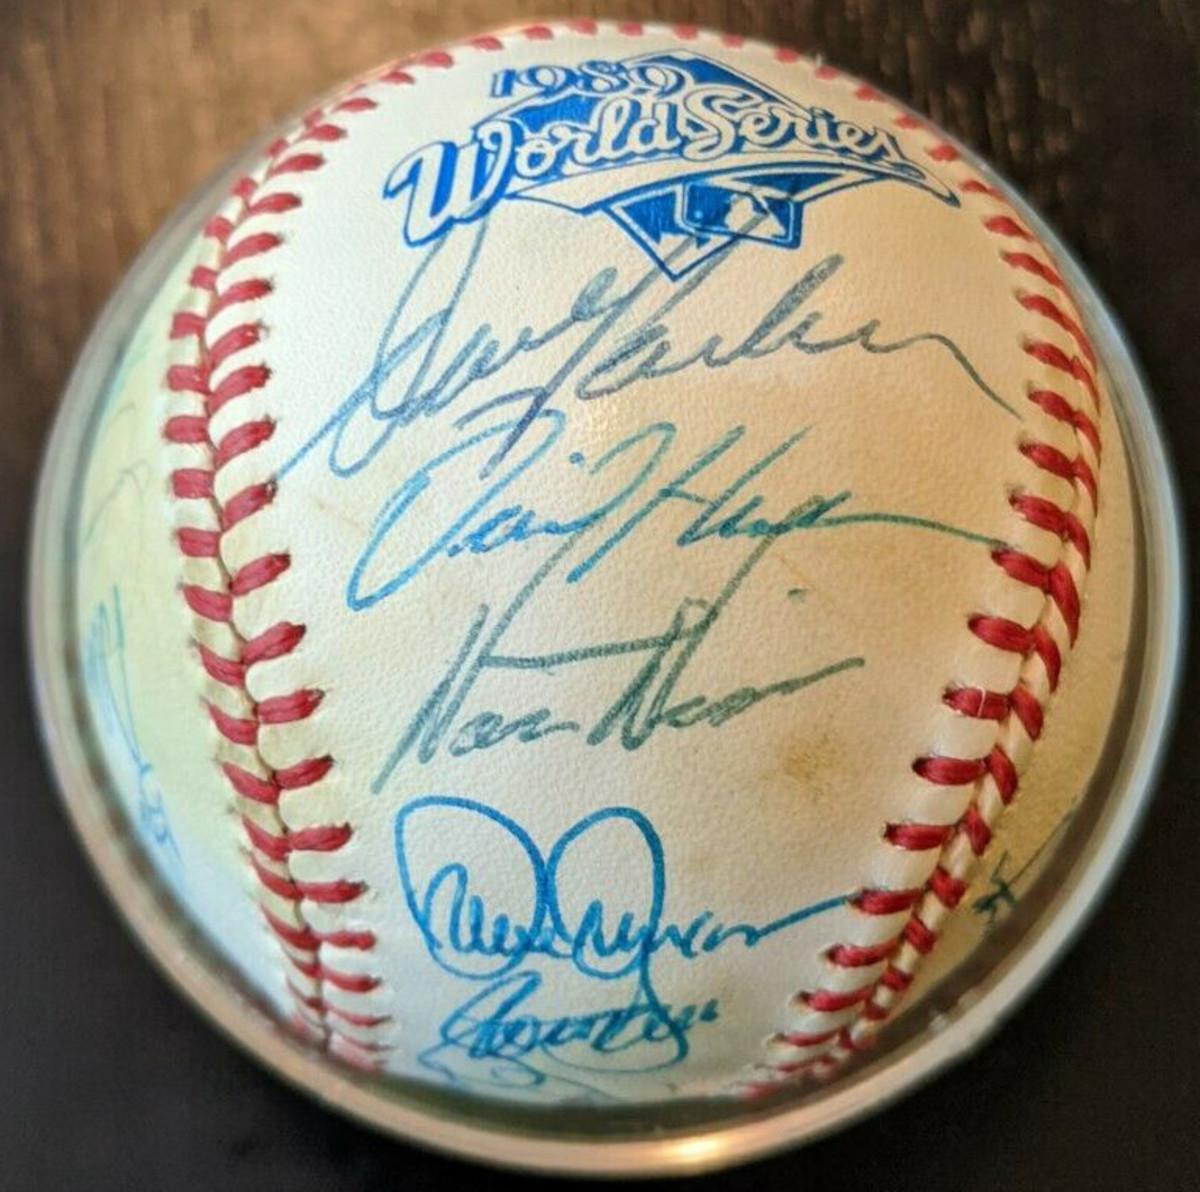 3A—oa-1989-oakland-world-series-ball-mcgwire-parker